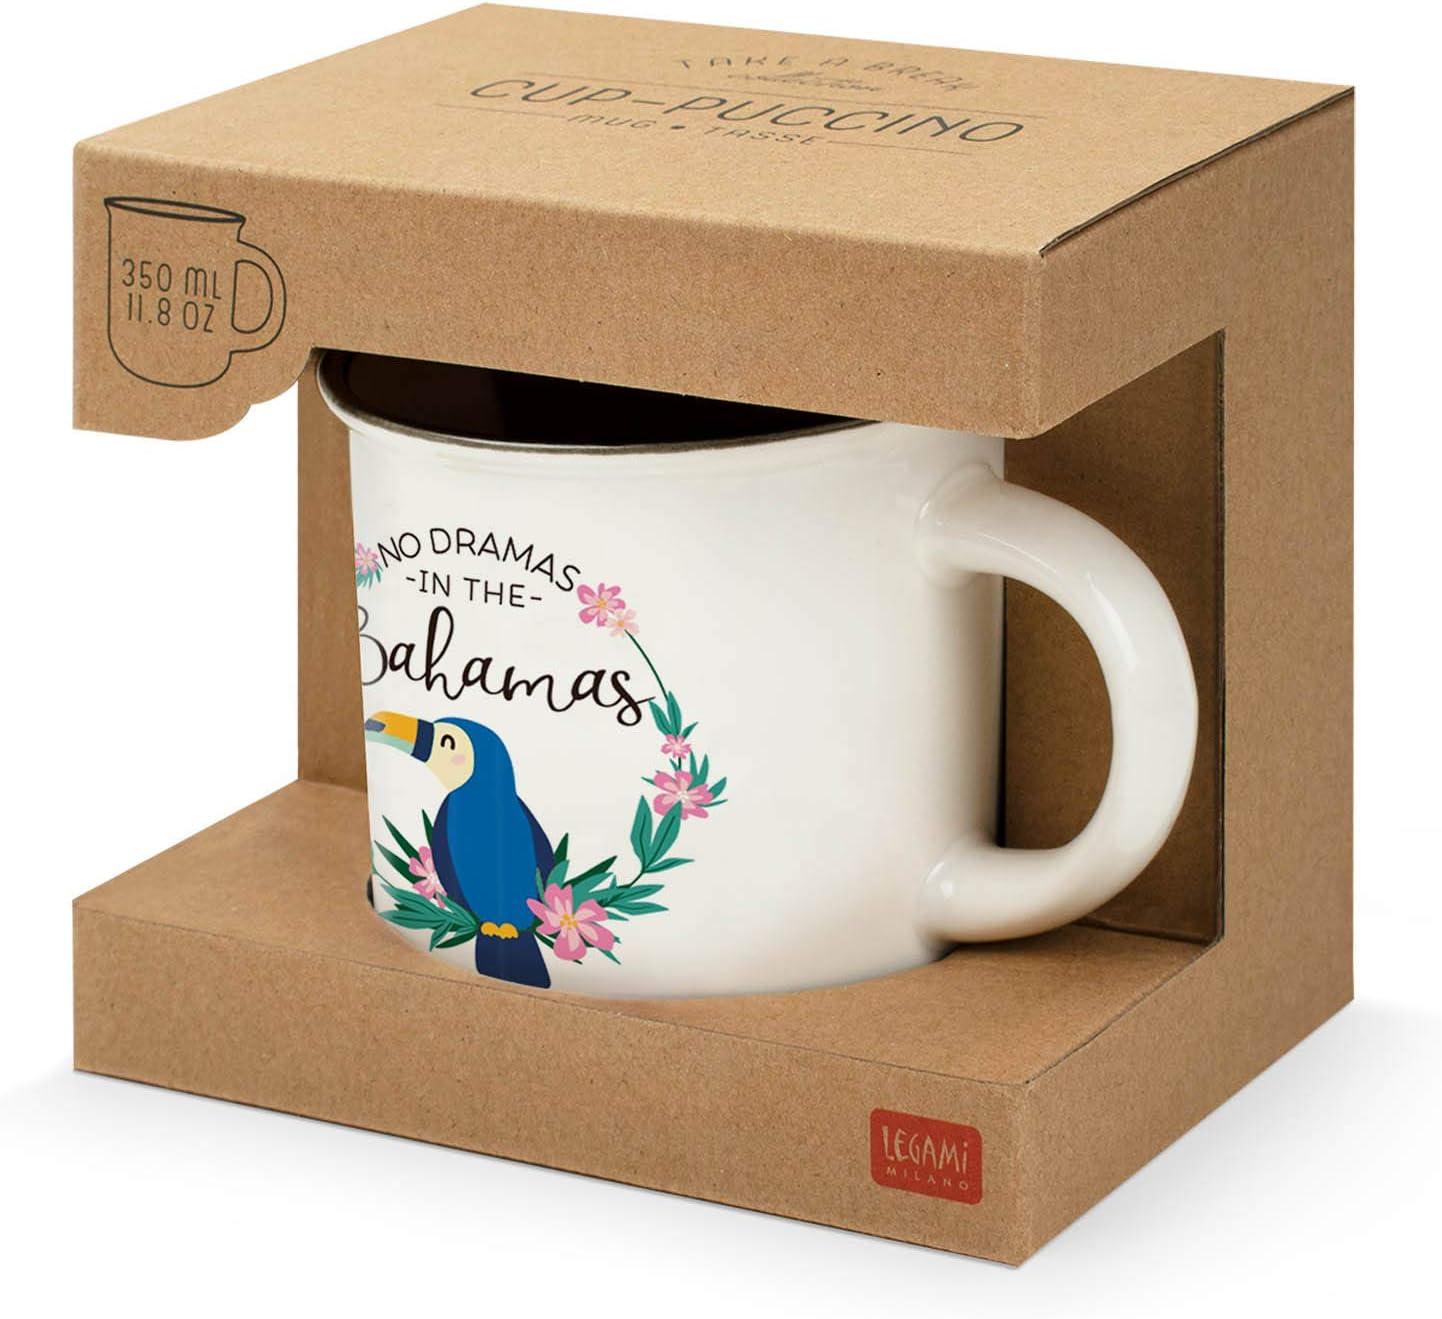 Toucan Knochenporzellan Porzellan Legami CUP0015 Tassen